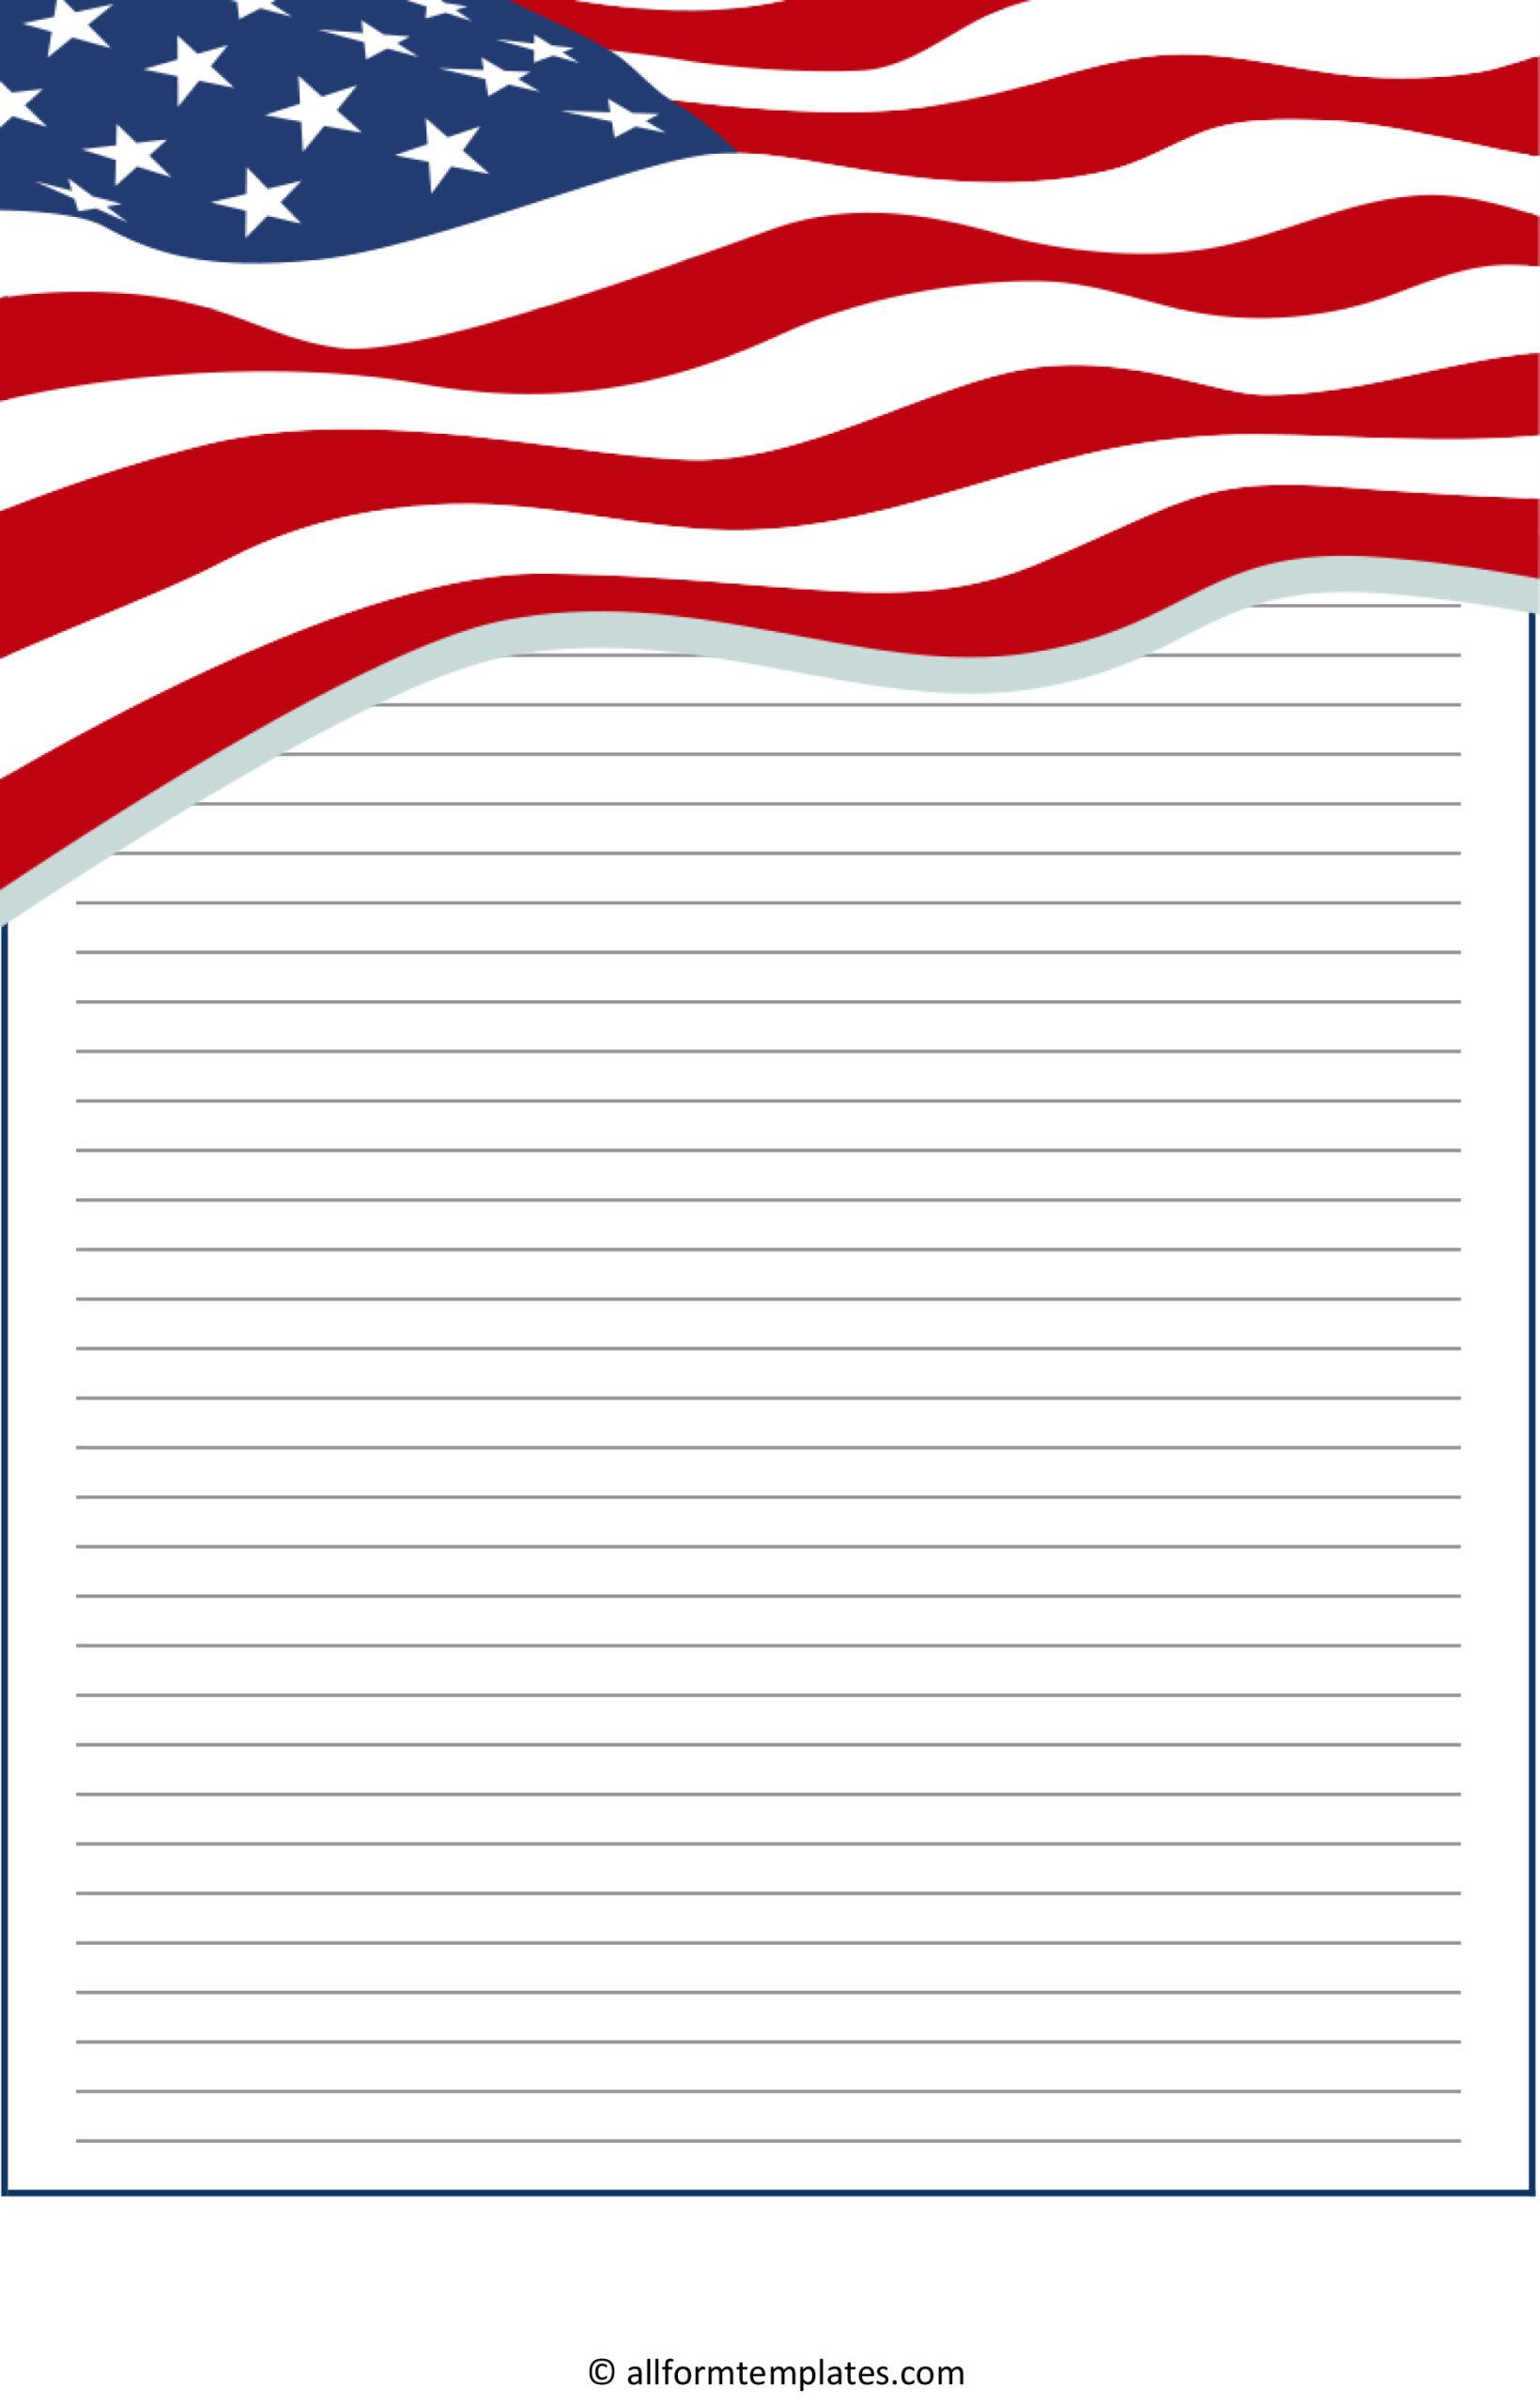 American-flag-writing-paper-HD